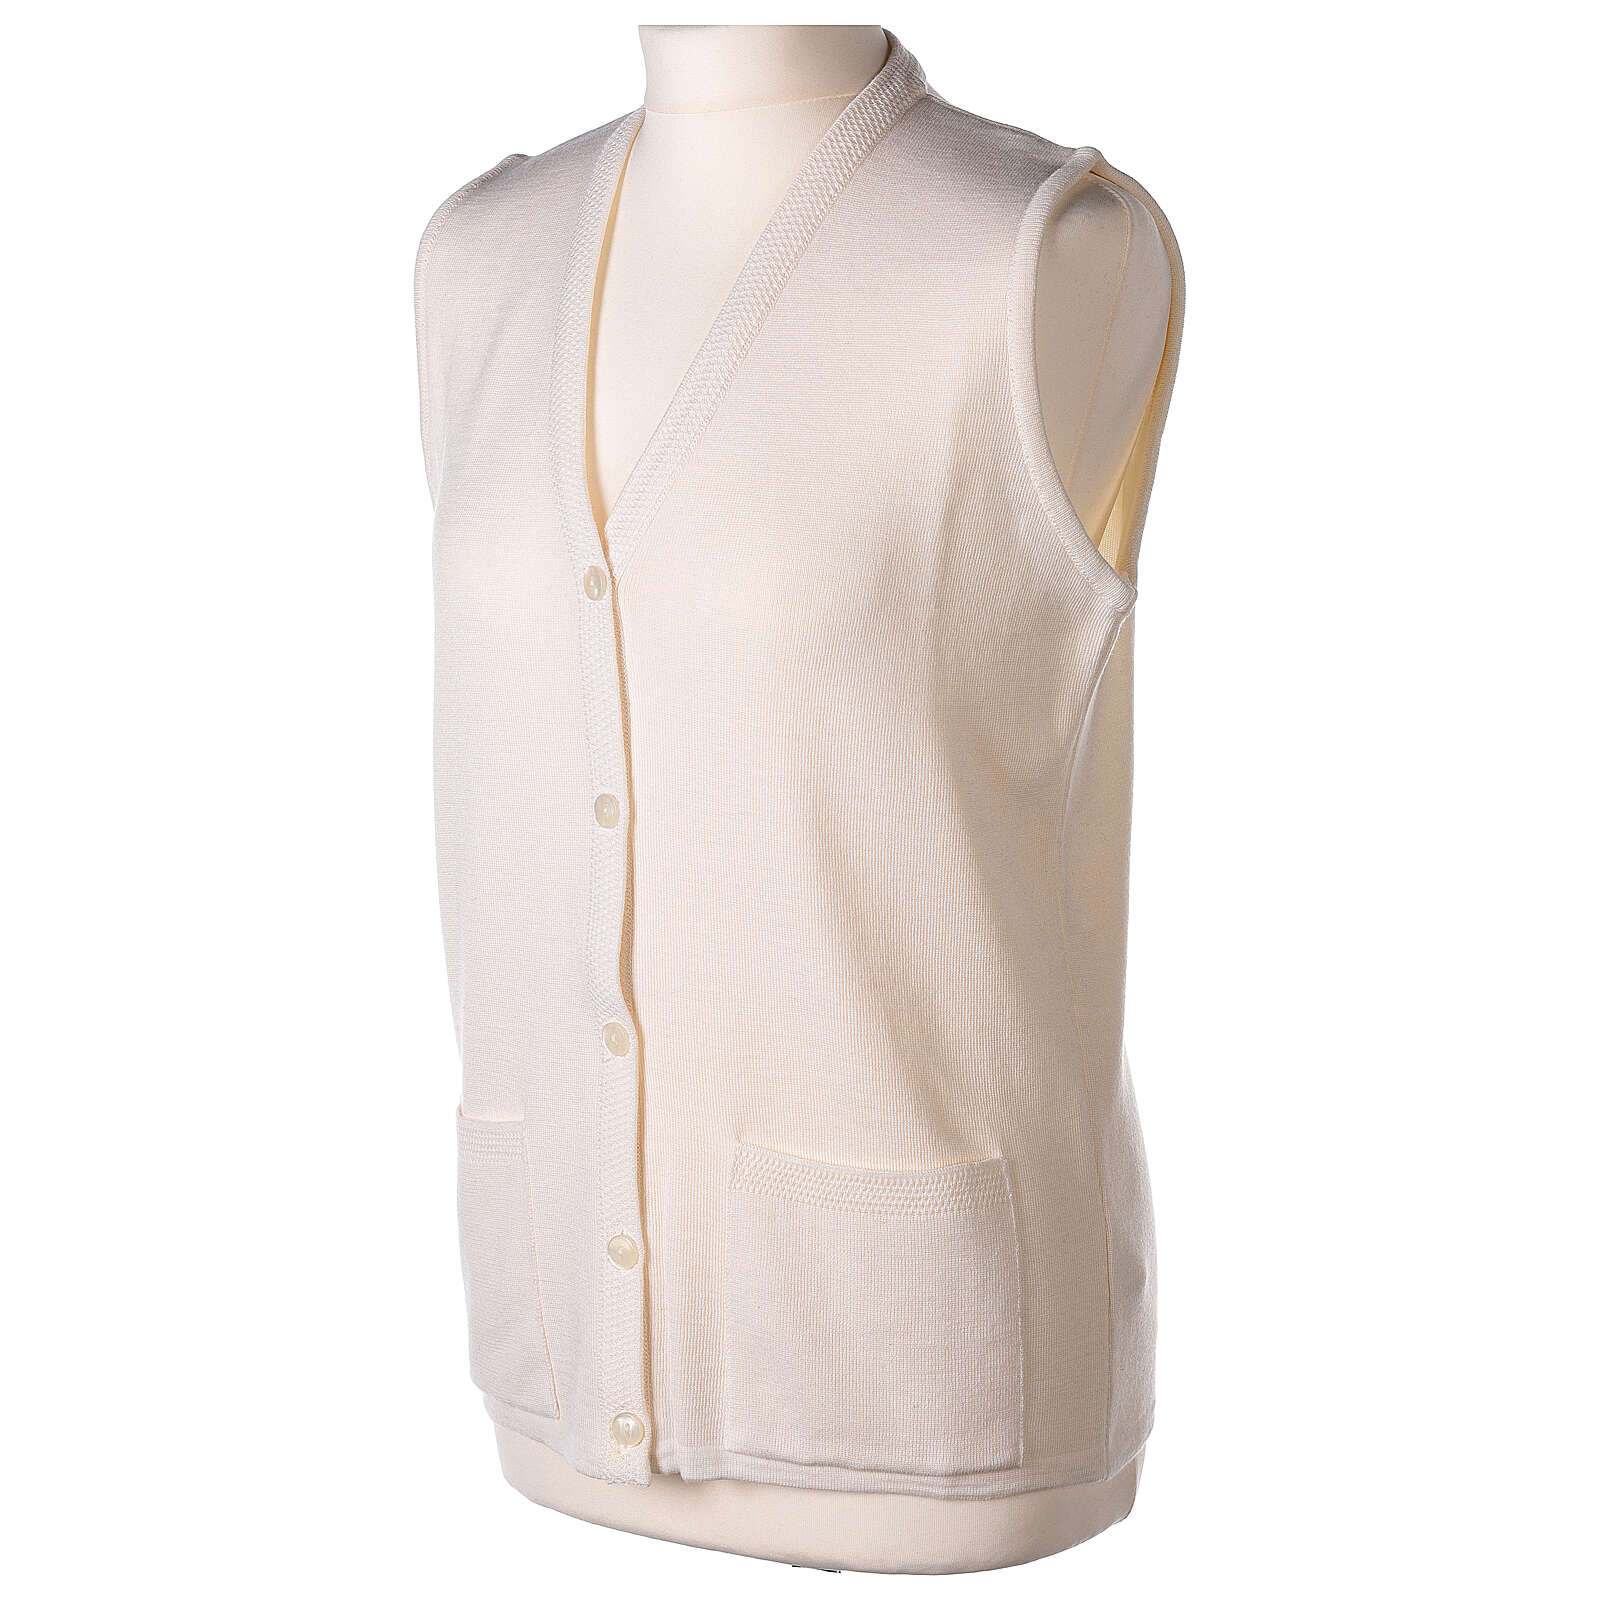 Nun white sleeveless cardigan with V-neck and pockets PLUS SIZES 50% merino wool 50% acrylic In Primis 4